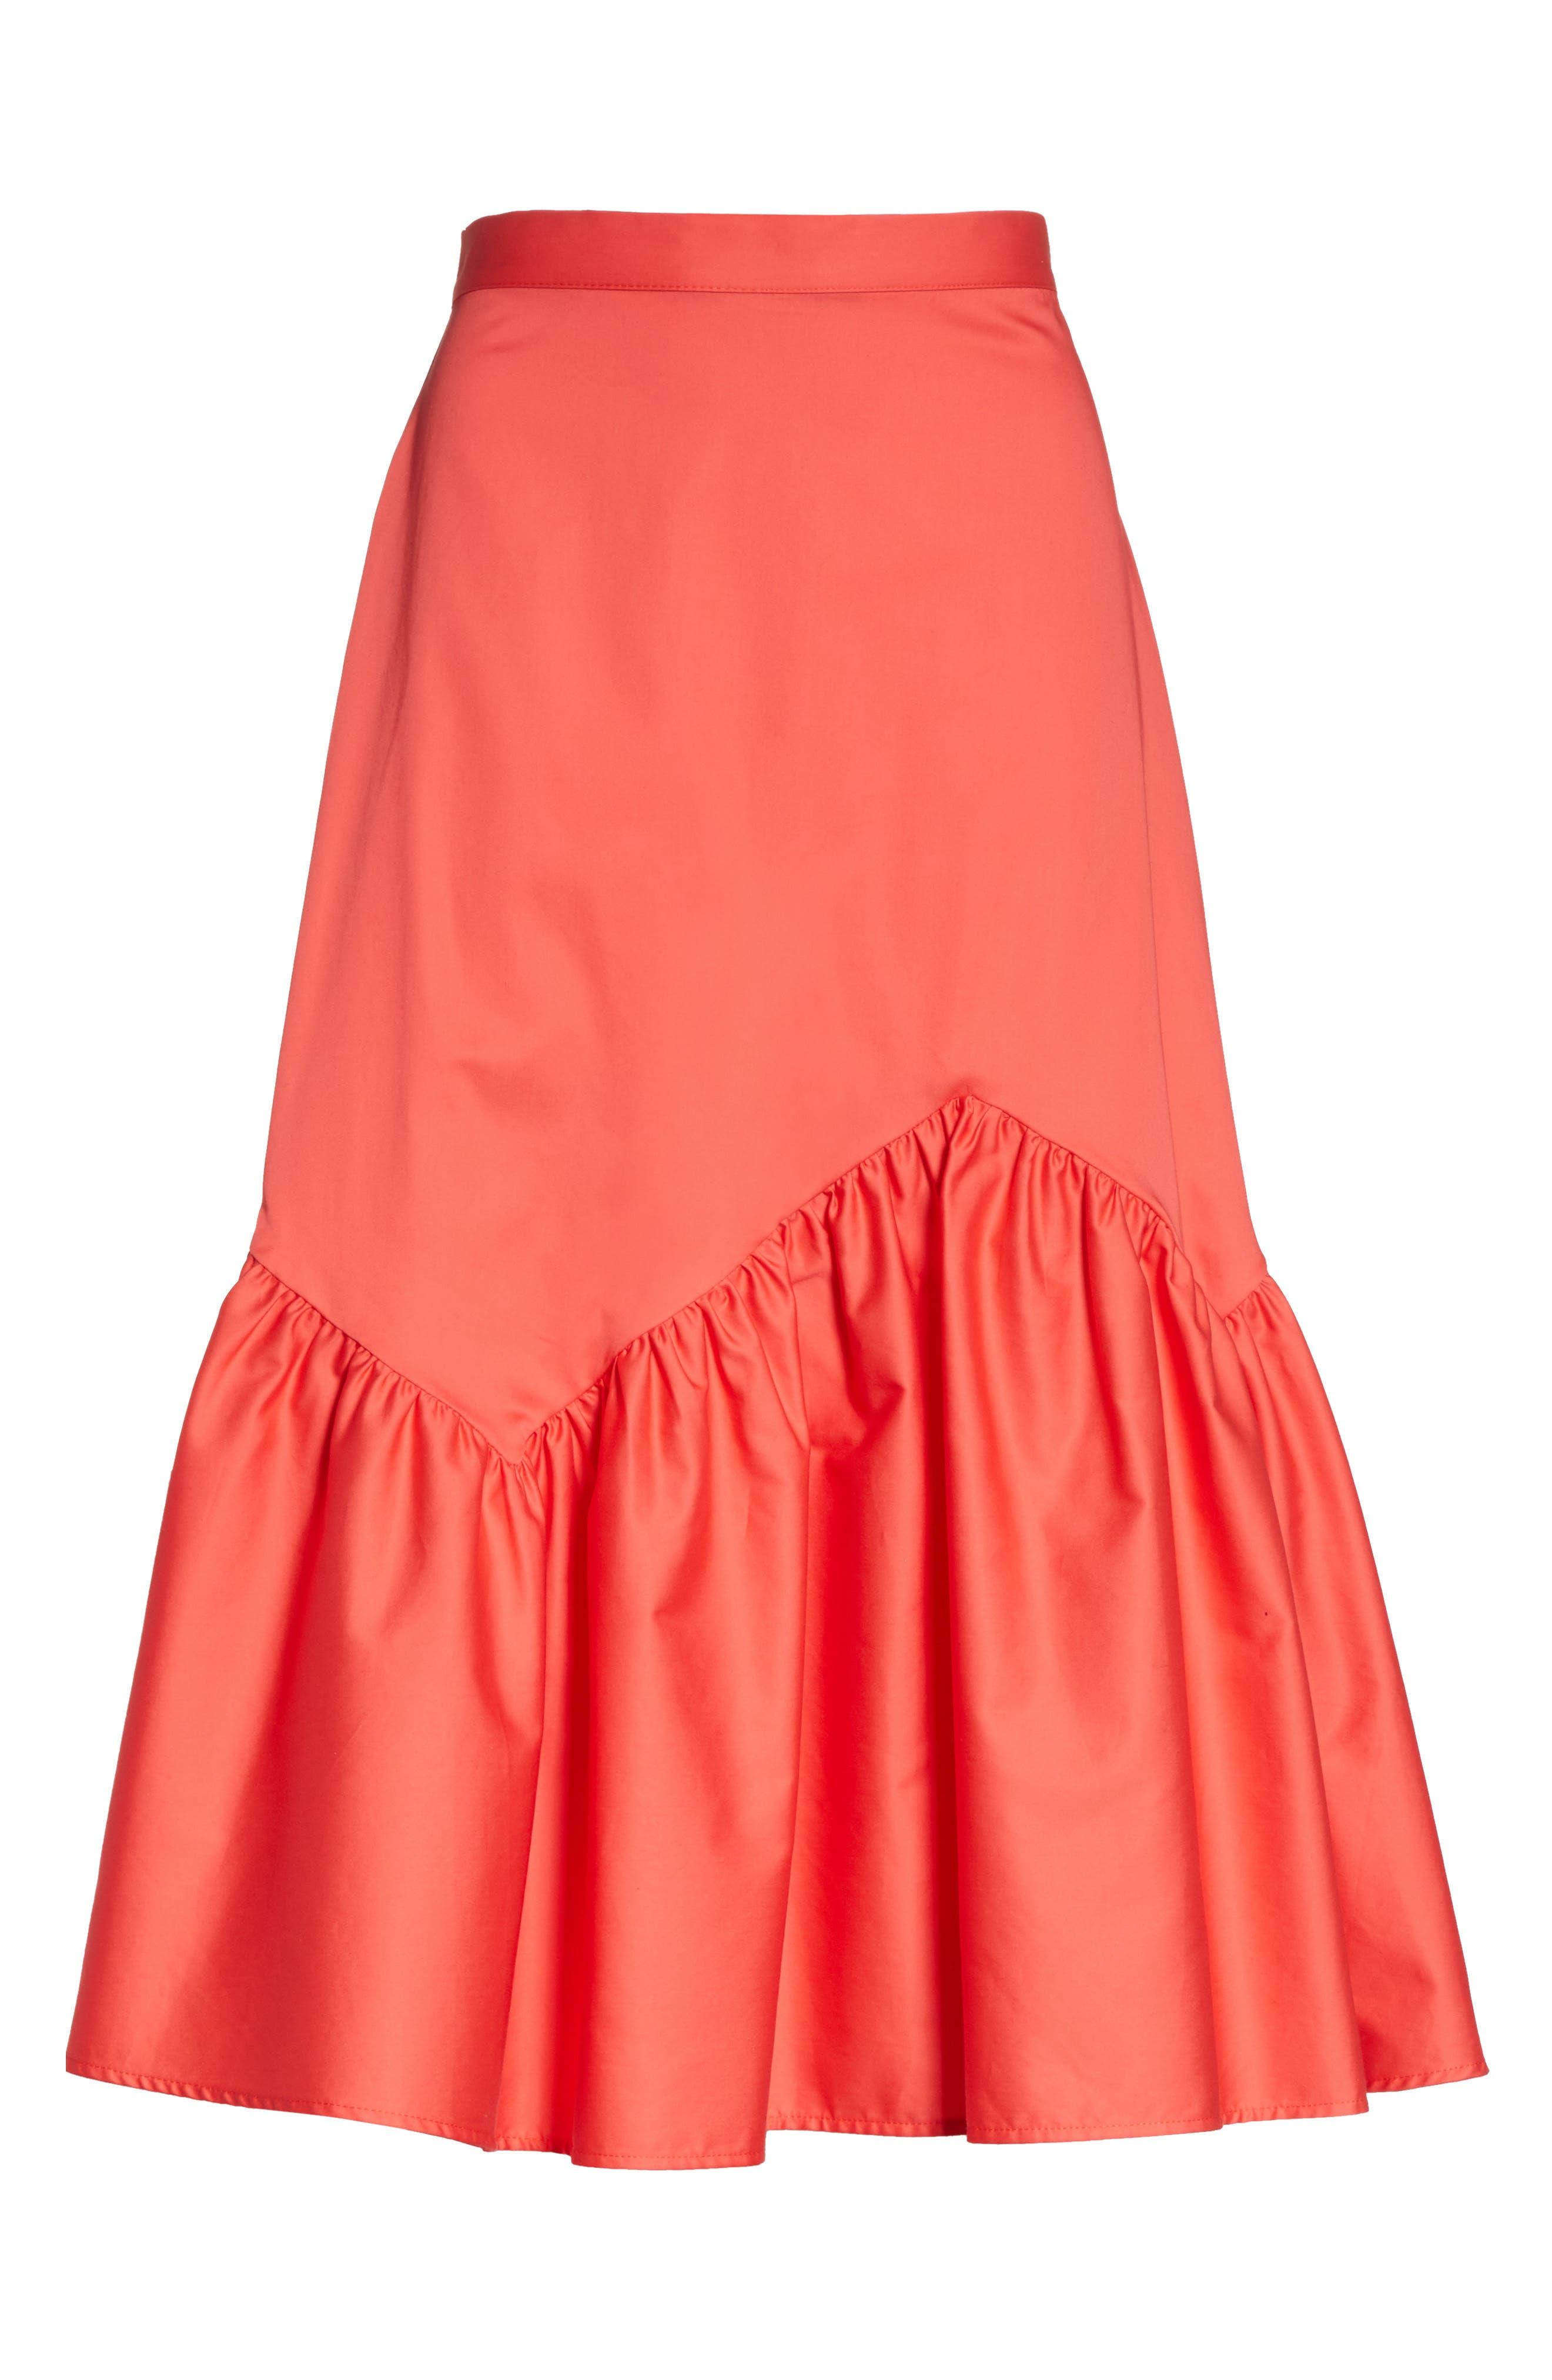 Prose & Poetry Tyra Midi Skirt,                             Alternate thumbnail 6, color,                             Watermelon